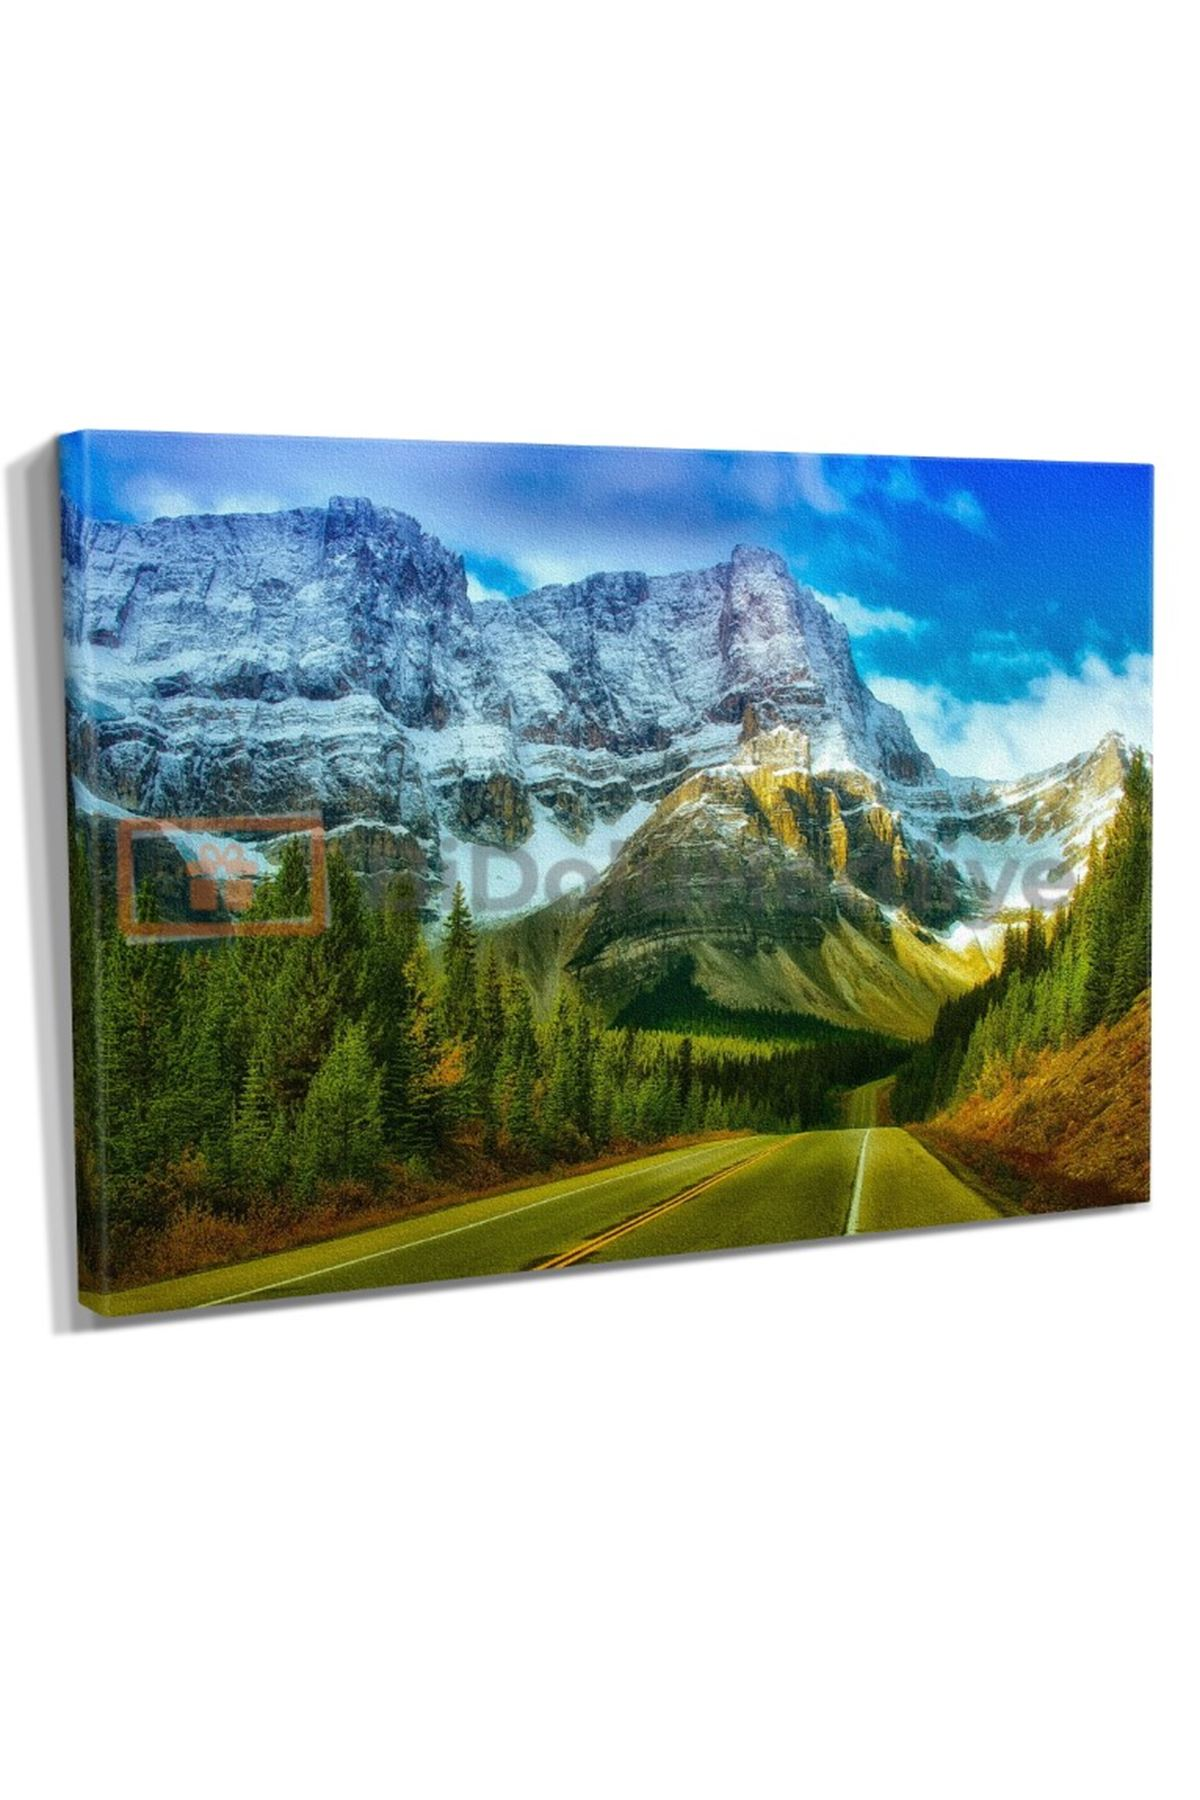 Banff Kanada Kanvas Tablo